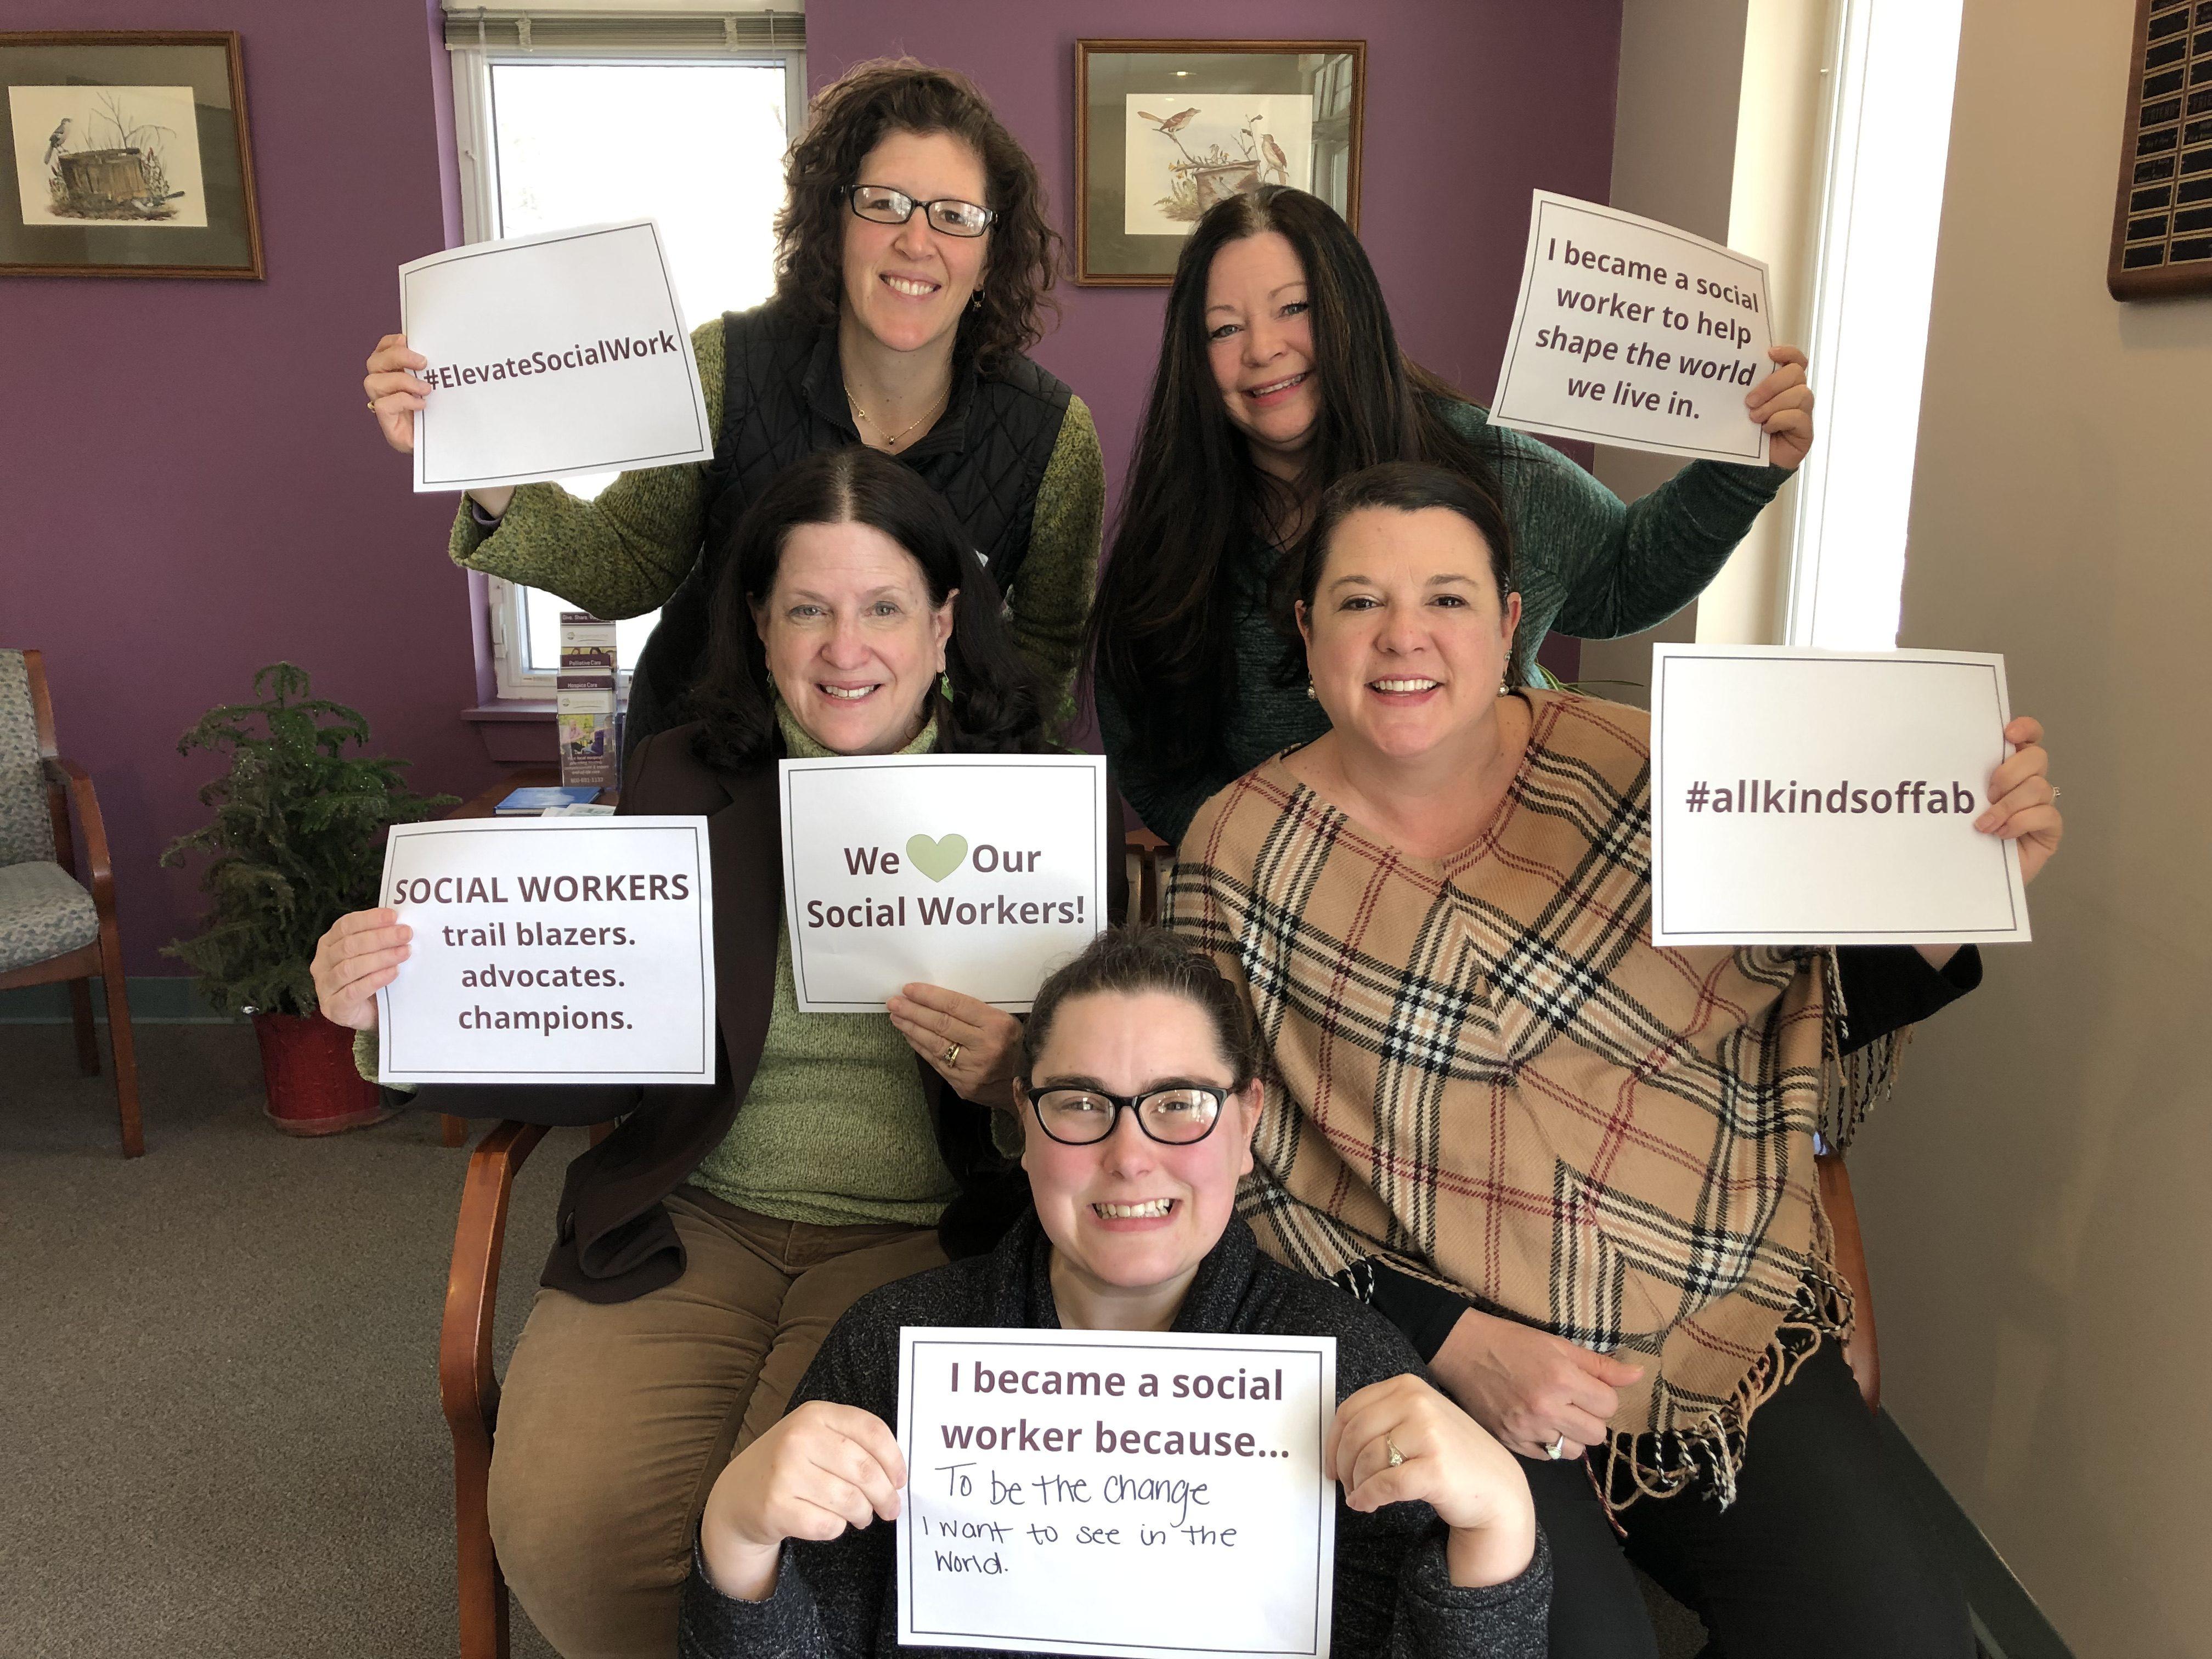 Cornerstone VNA Celebrates National Social Work Month